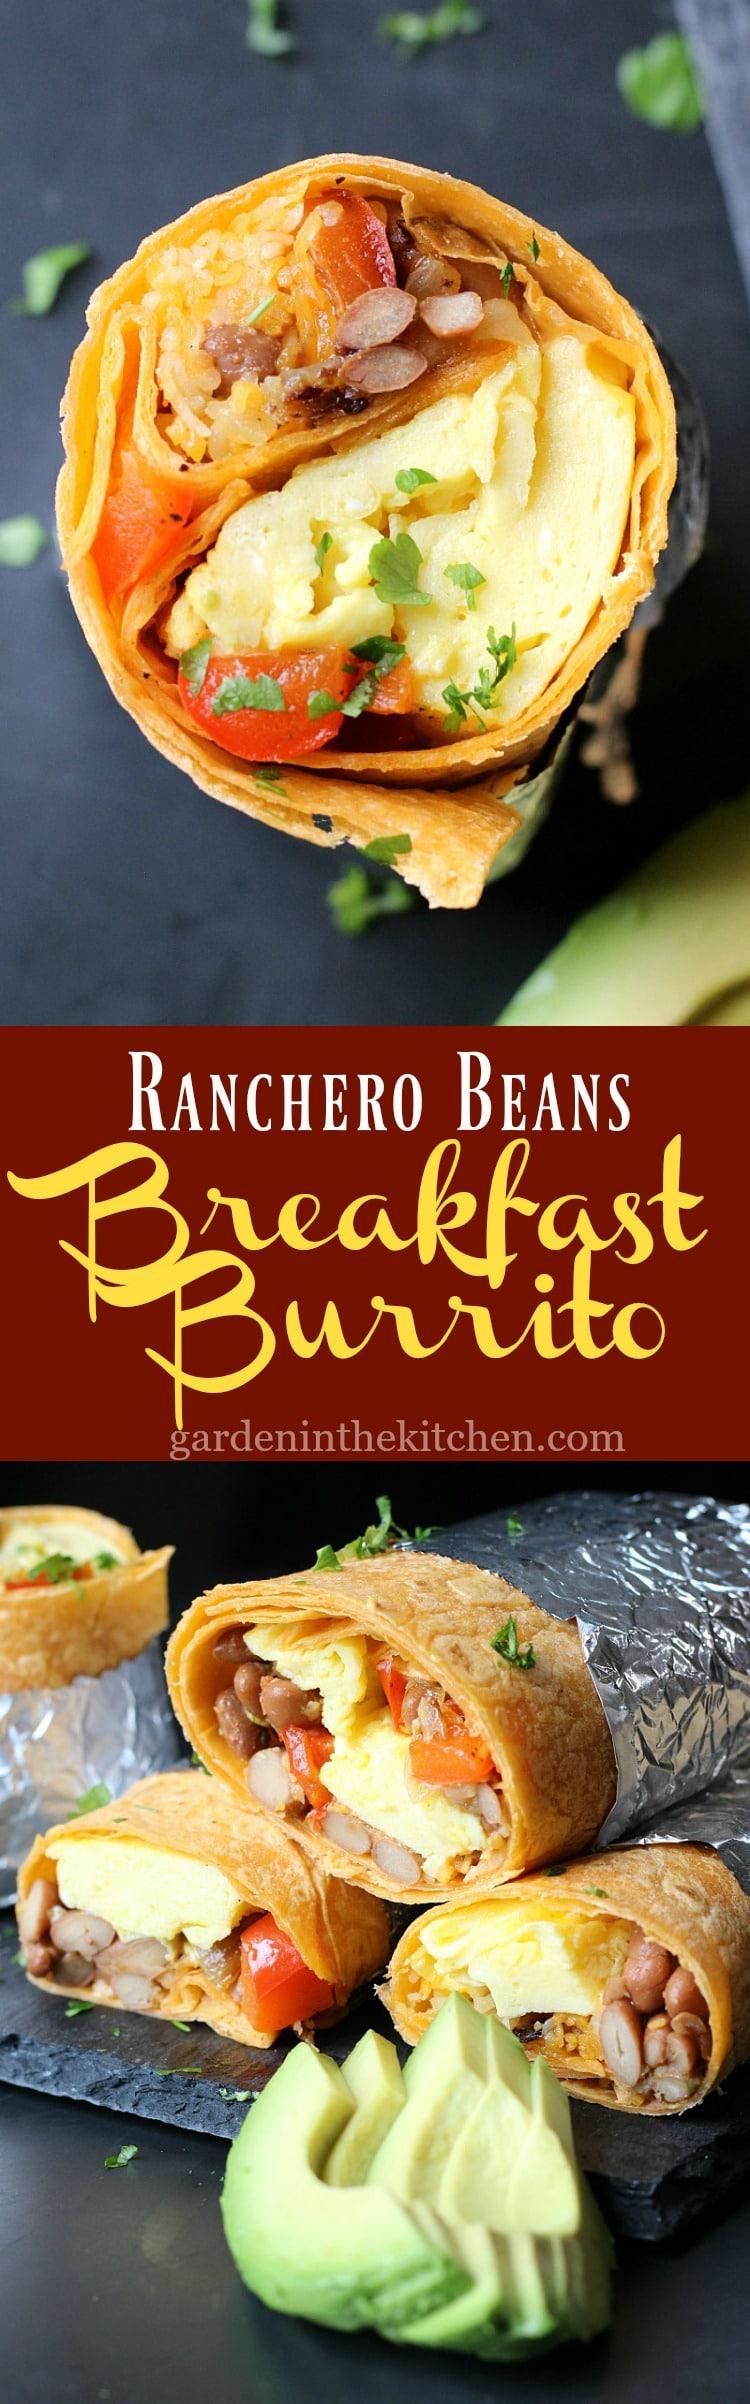 Ranchero Beans Breakfast Burrito